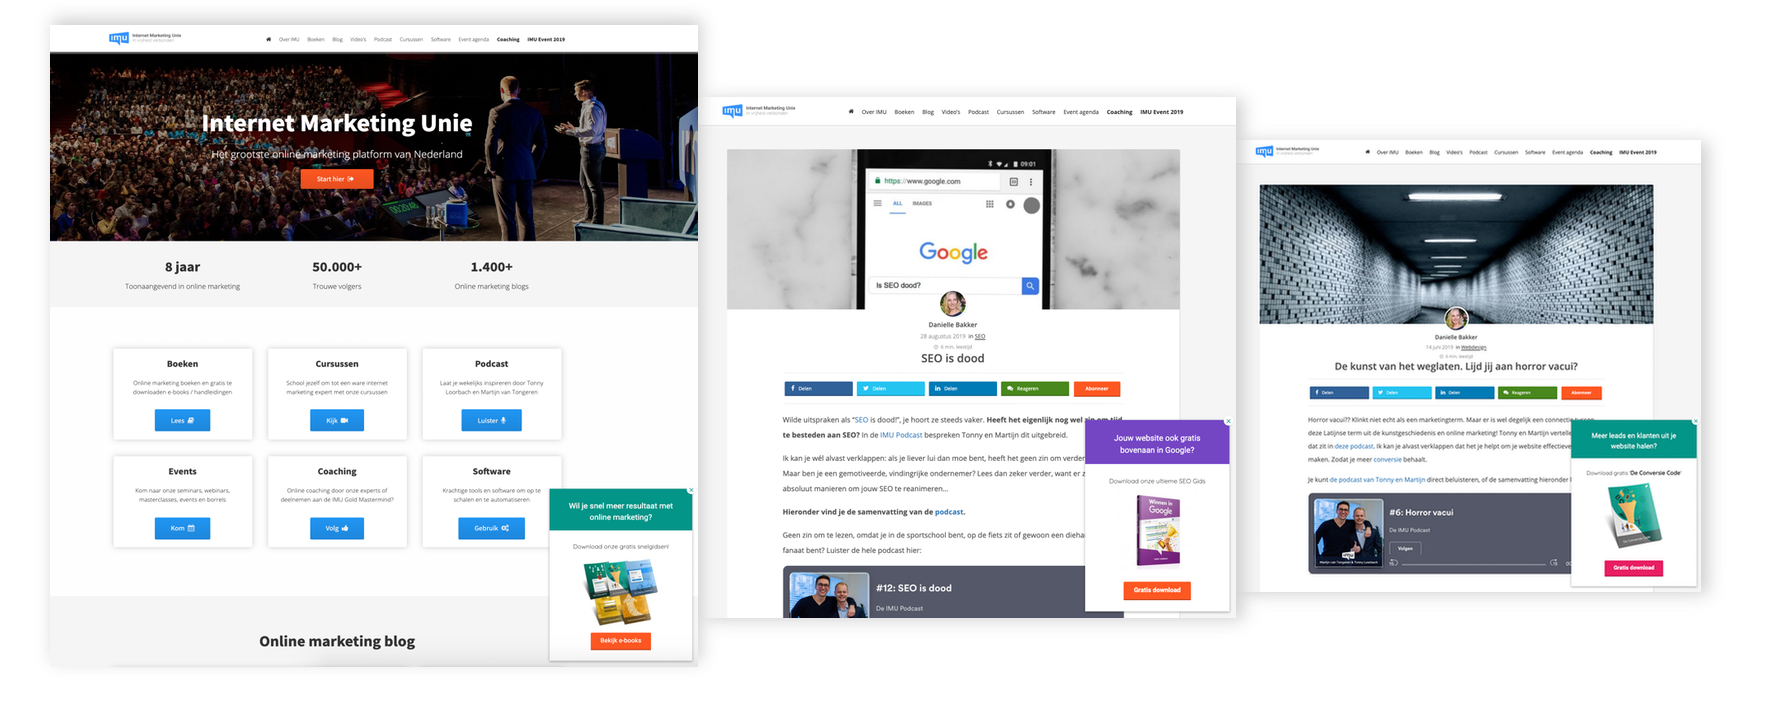 Conversie tools voor meer opt-ins en leads